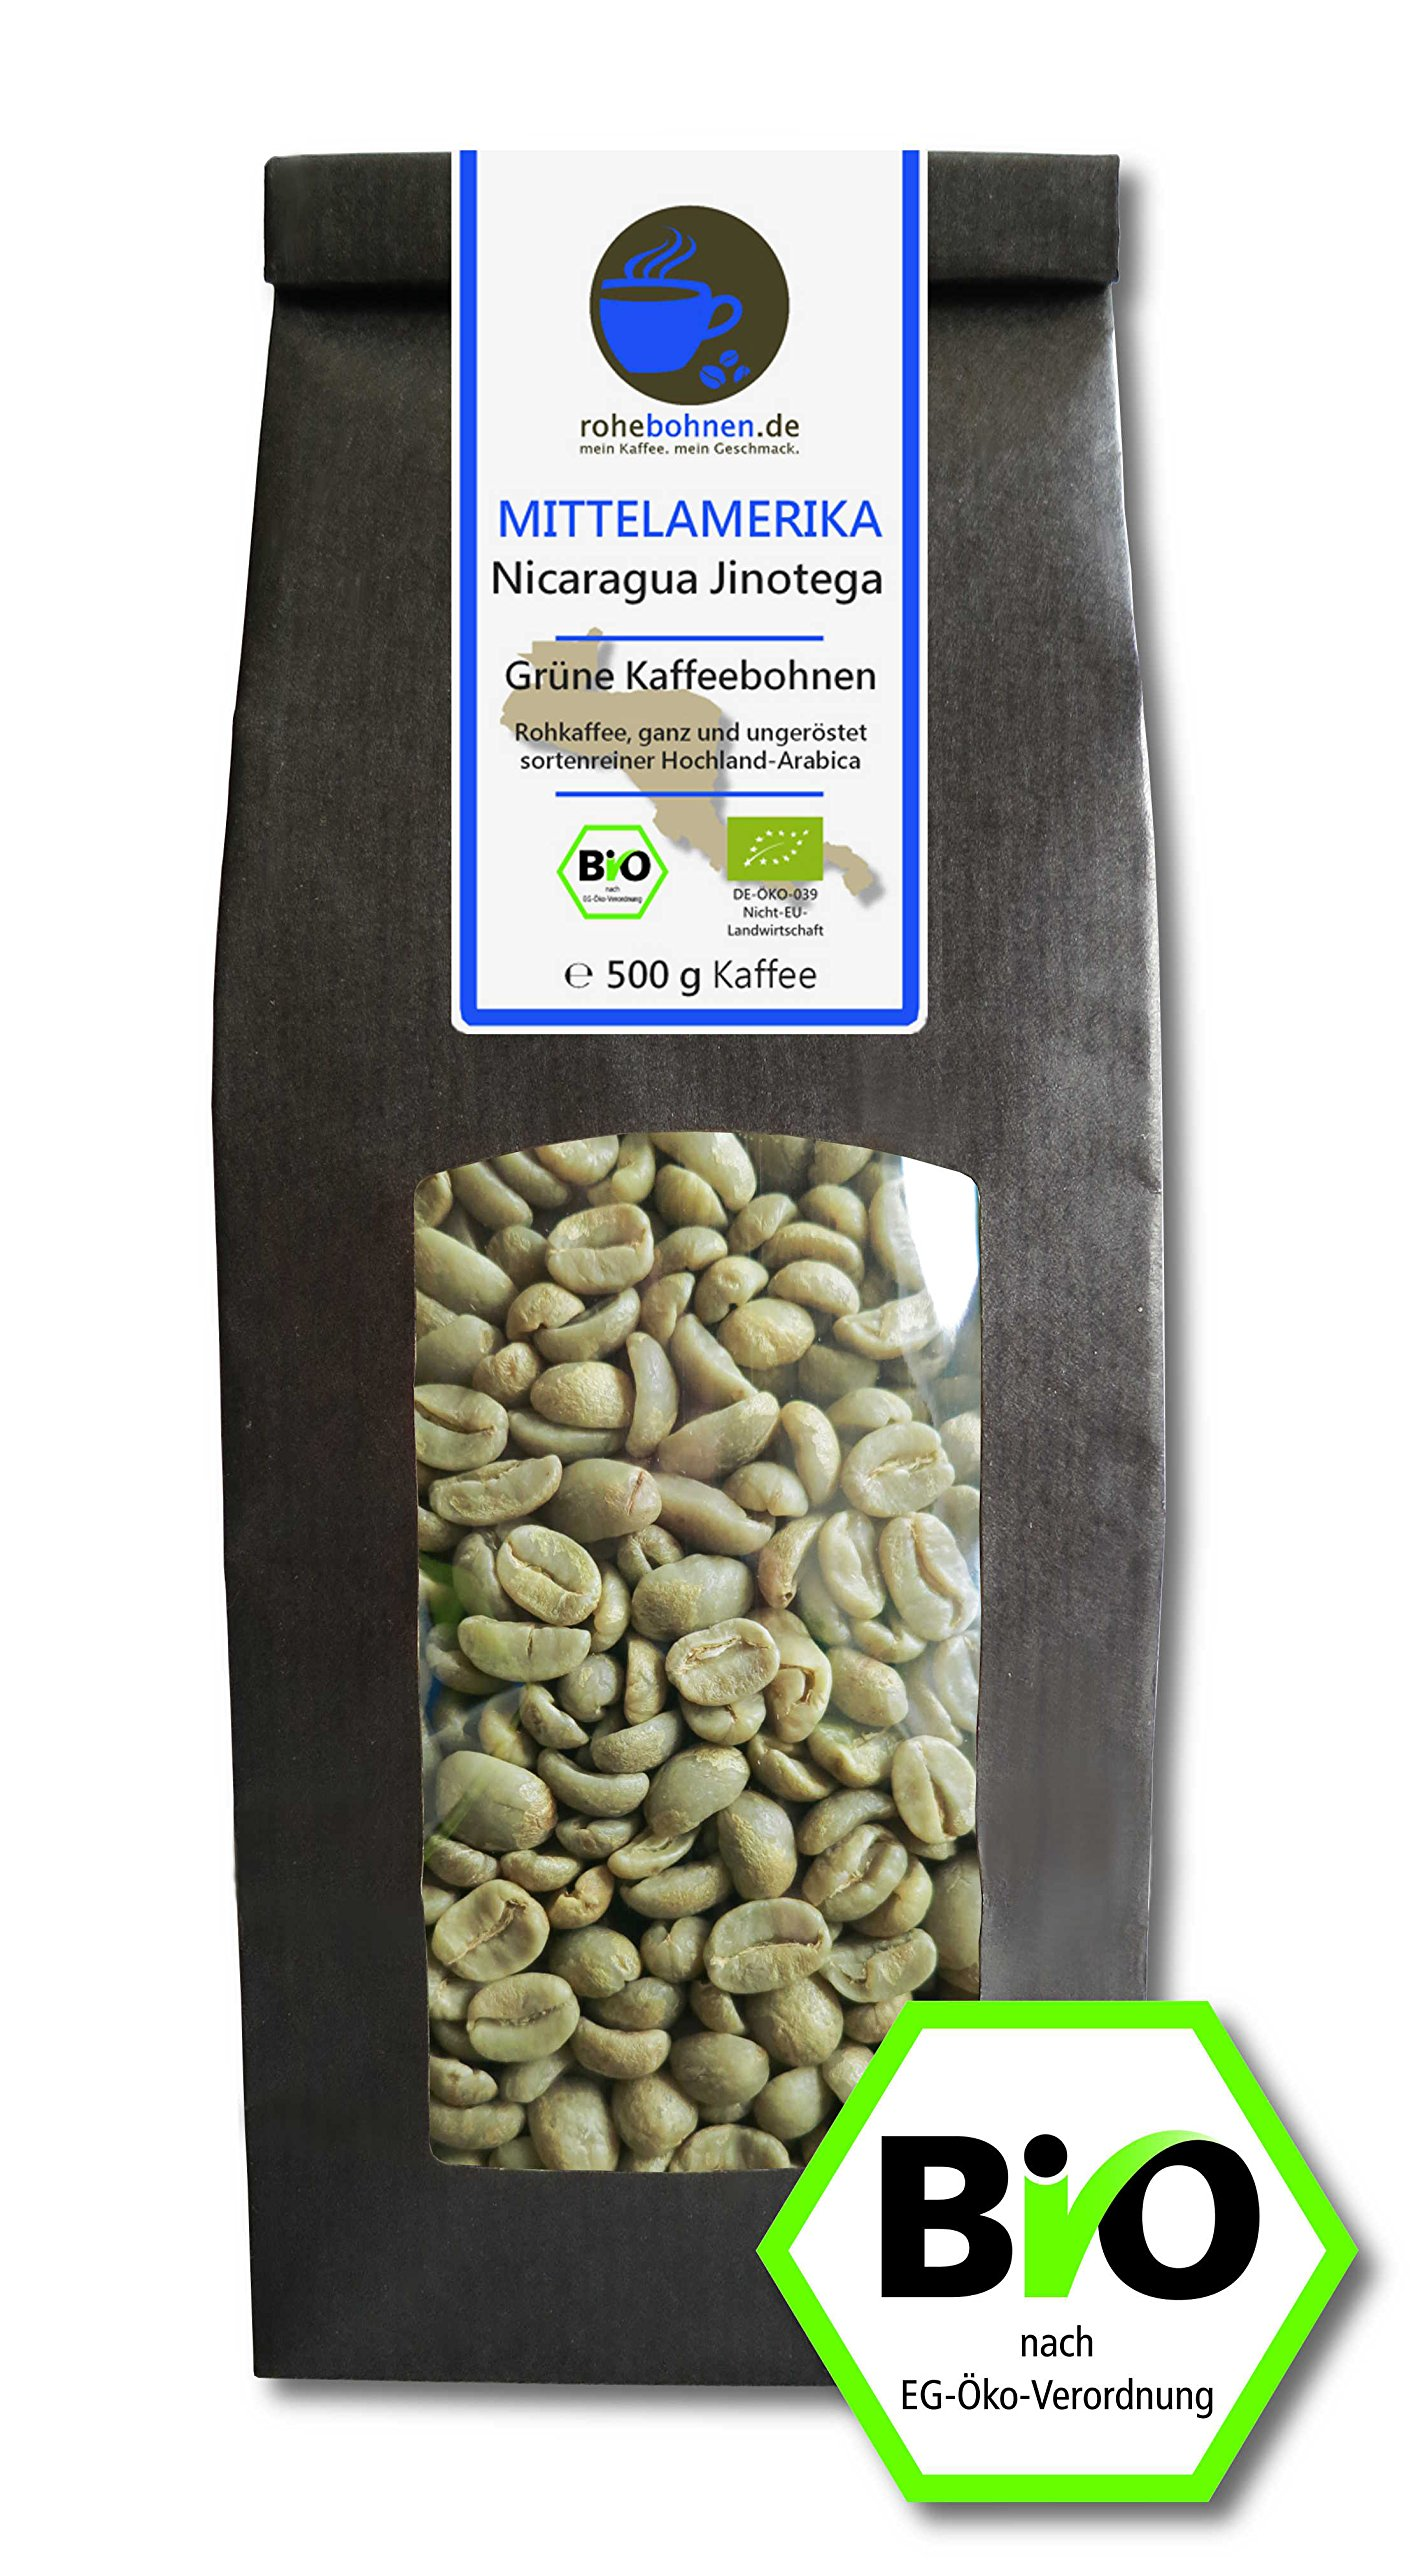 Organic-Green-Coffee-Beans-Nicaragua-Highland-raw-Coffee-Beans